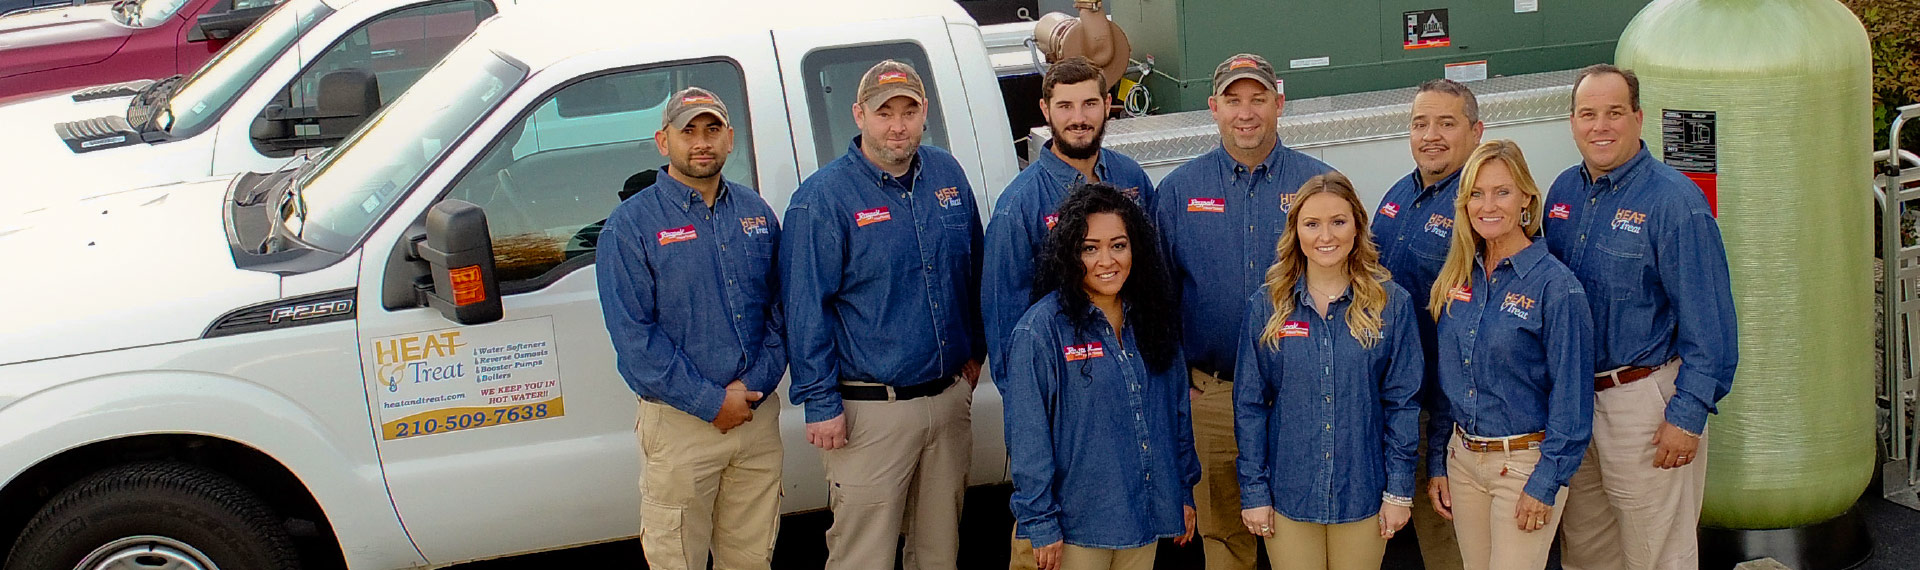 Raypak boilers| hydromatic pumps | commercial water softeners | Heat & Treat team | Heat & Treat Texas